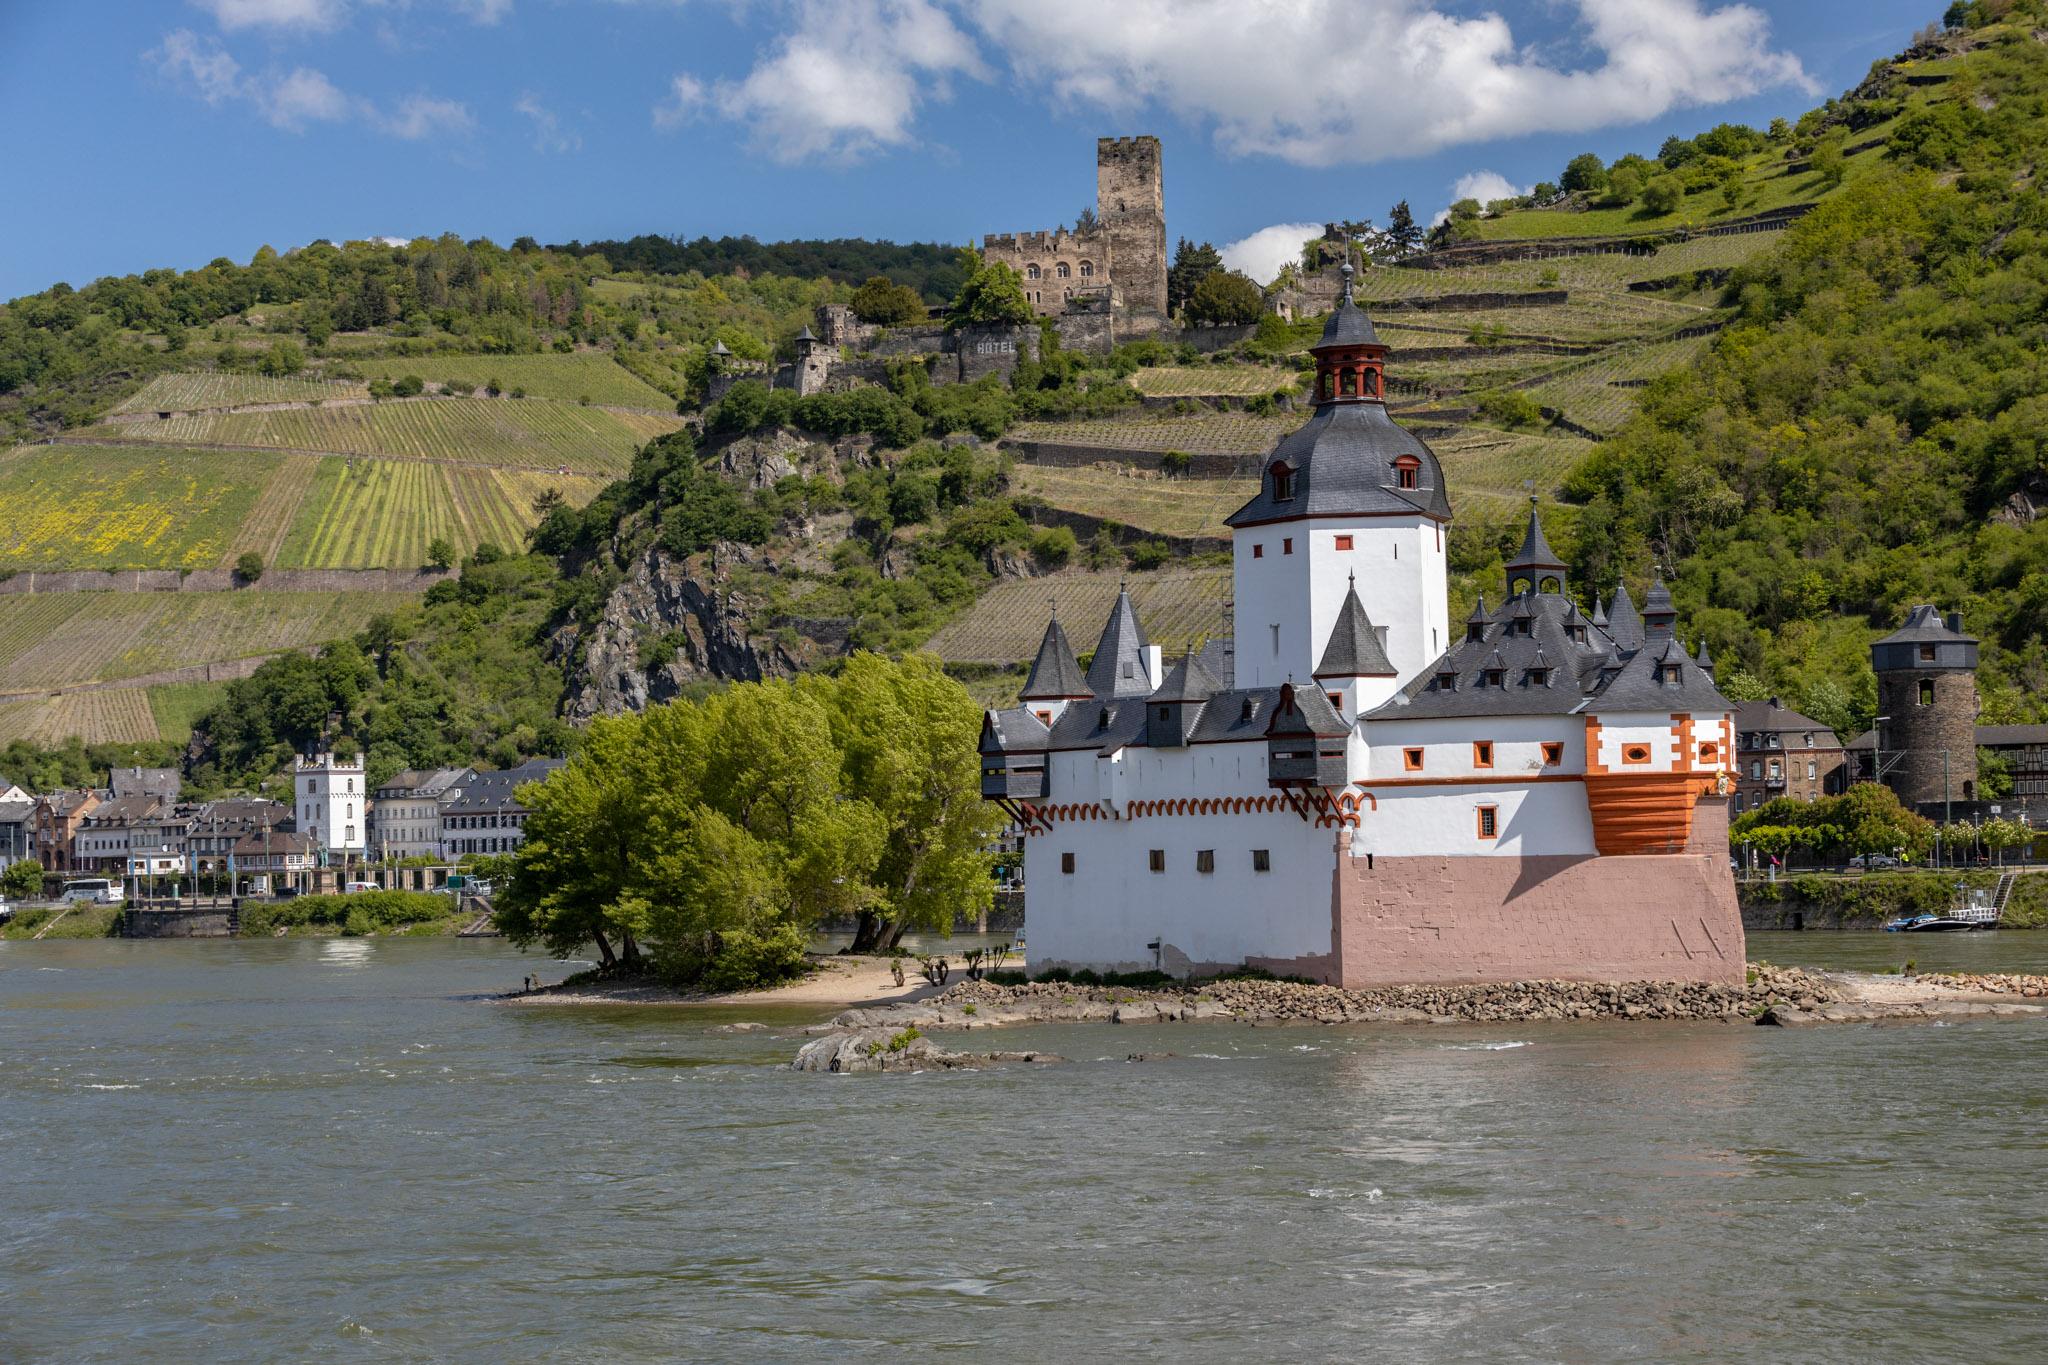 DonnaMarshall_Castles on the Rhine_2495